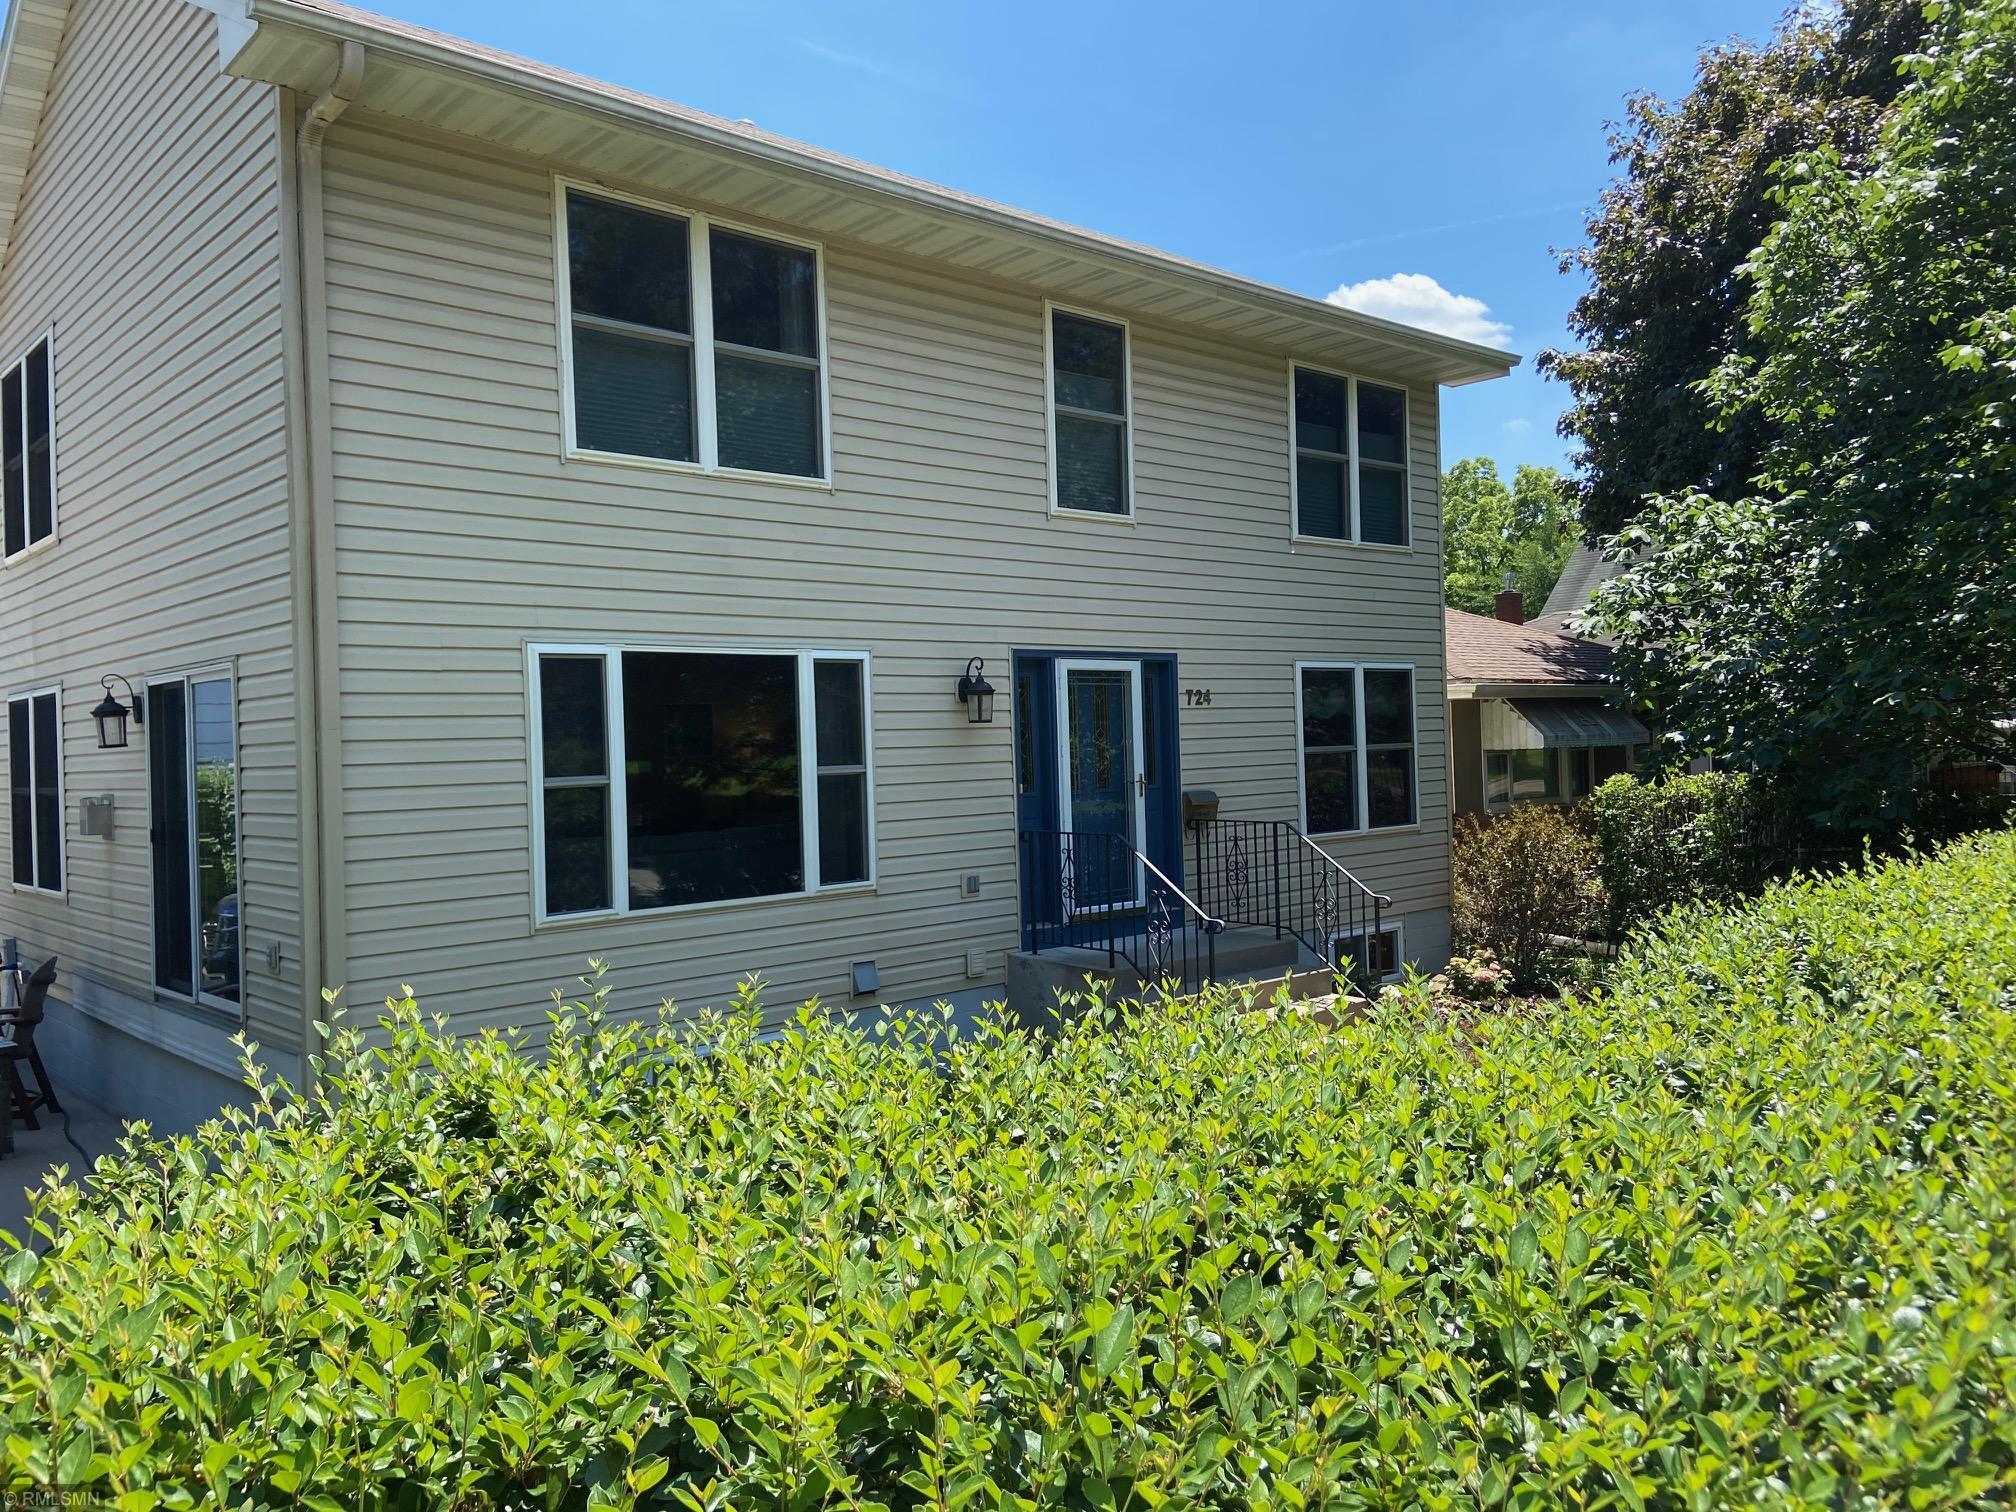 724 Lexington S Property Photo - Saint Paul, MN real estate listing